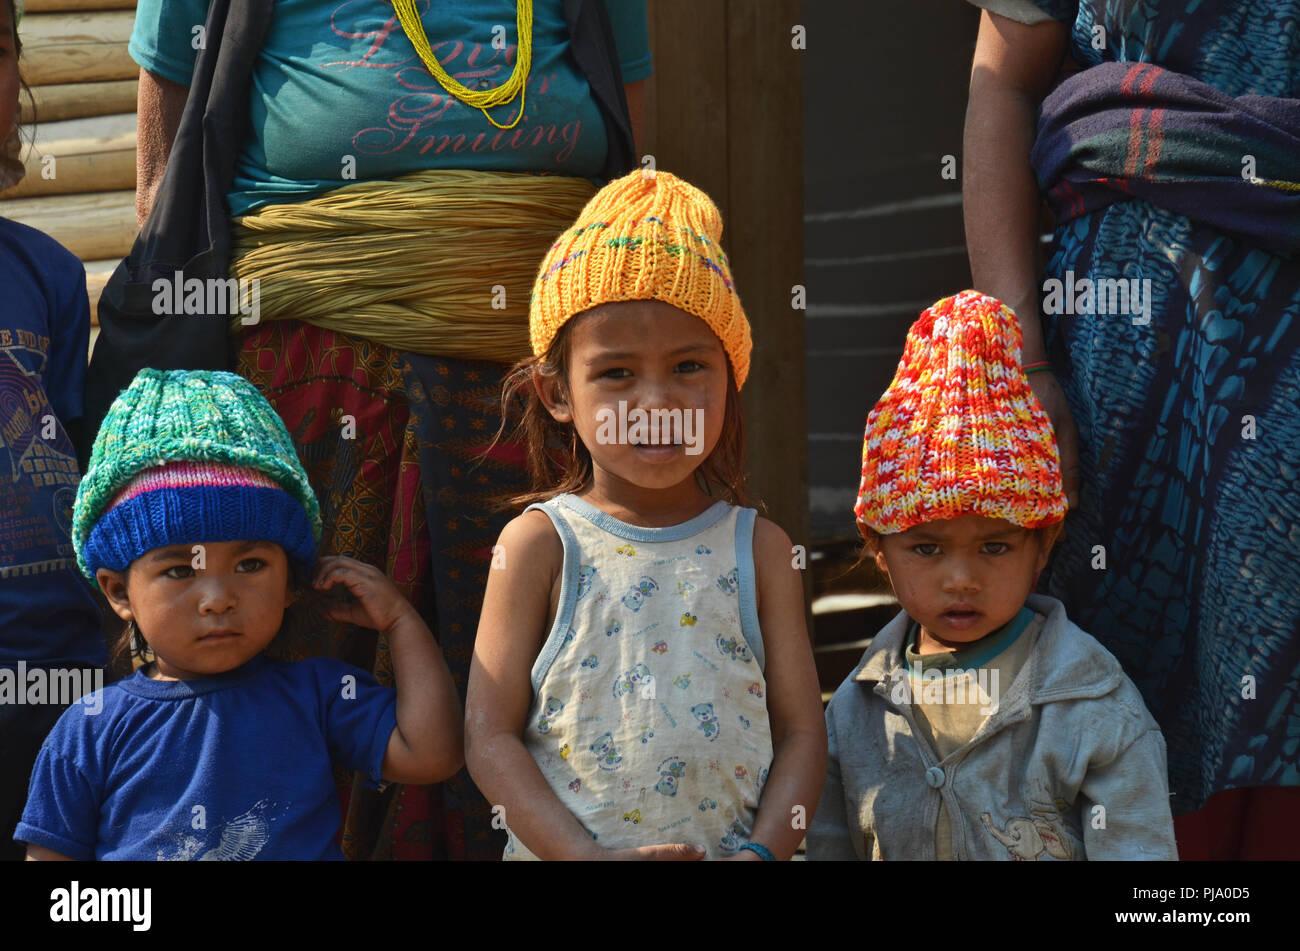 Dalit (untouchable) children in the village of Tamakhani, Solukhumbu, Nepal - Stock Image